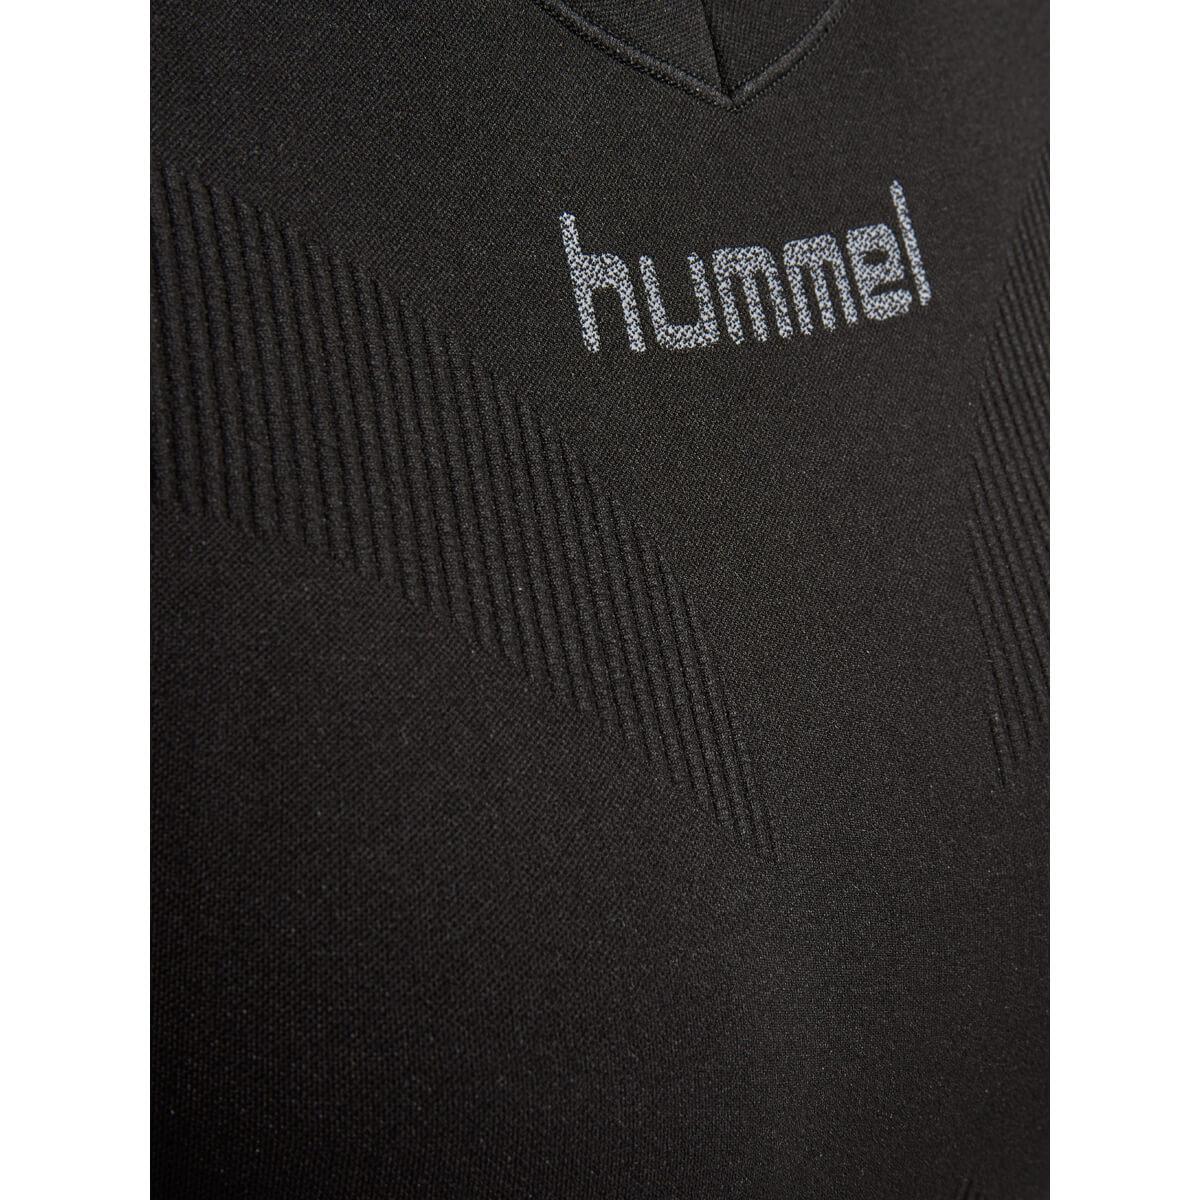 hummel First Comfort Trænings T-shirt Dame